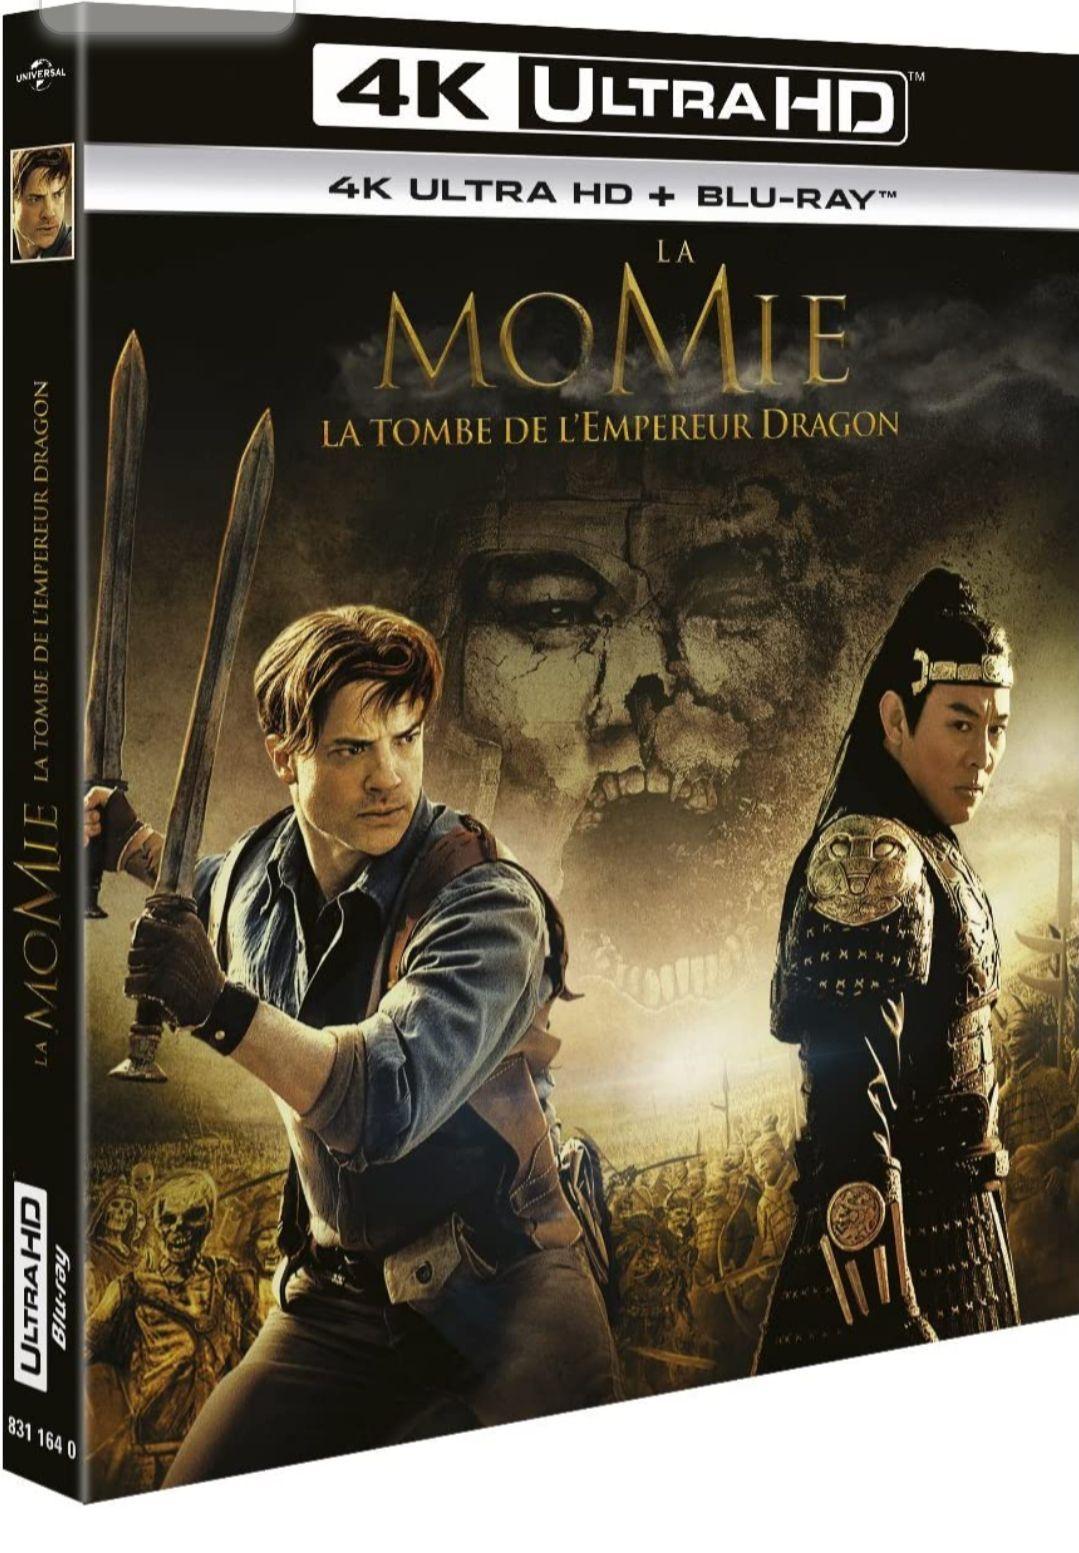 Sélection de Blu-ray 4K en promotion à 10€ - Ex : Blu-Ray 4K UHD + Blu-Ray La Momie : La Tombe de l'Empereur Dragon